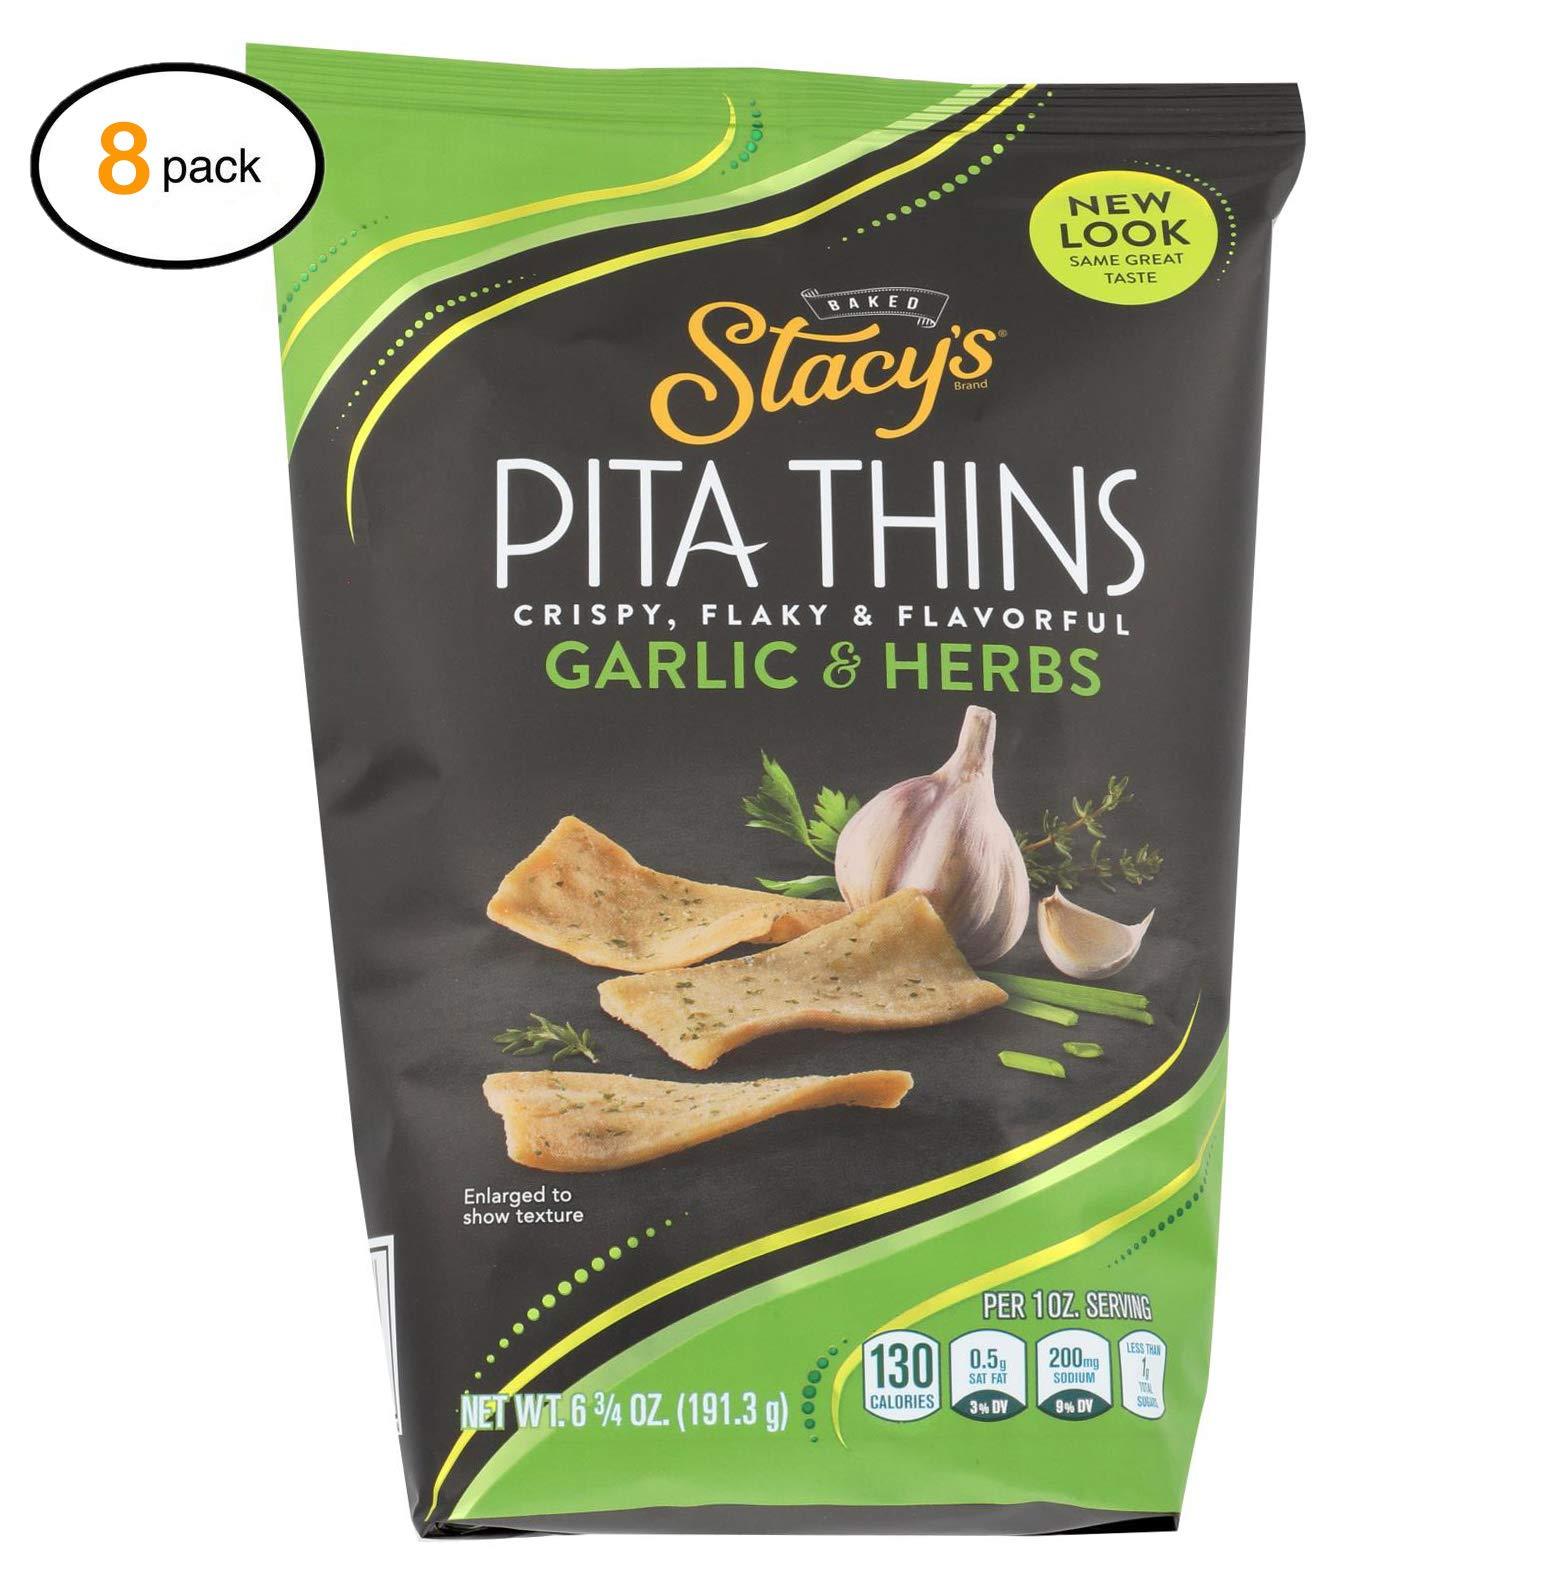 Stacy's Pita Chips Pеrfеctly Thymеd Pita Crisps - Casе оf 8-6.75 оz. - Bulk Buy by Stacy's Pita Chips